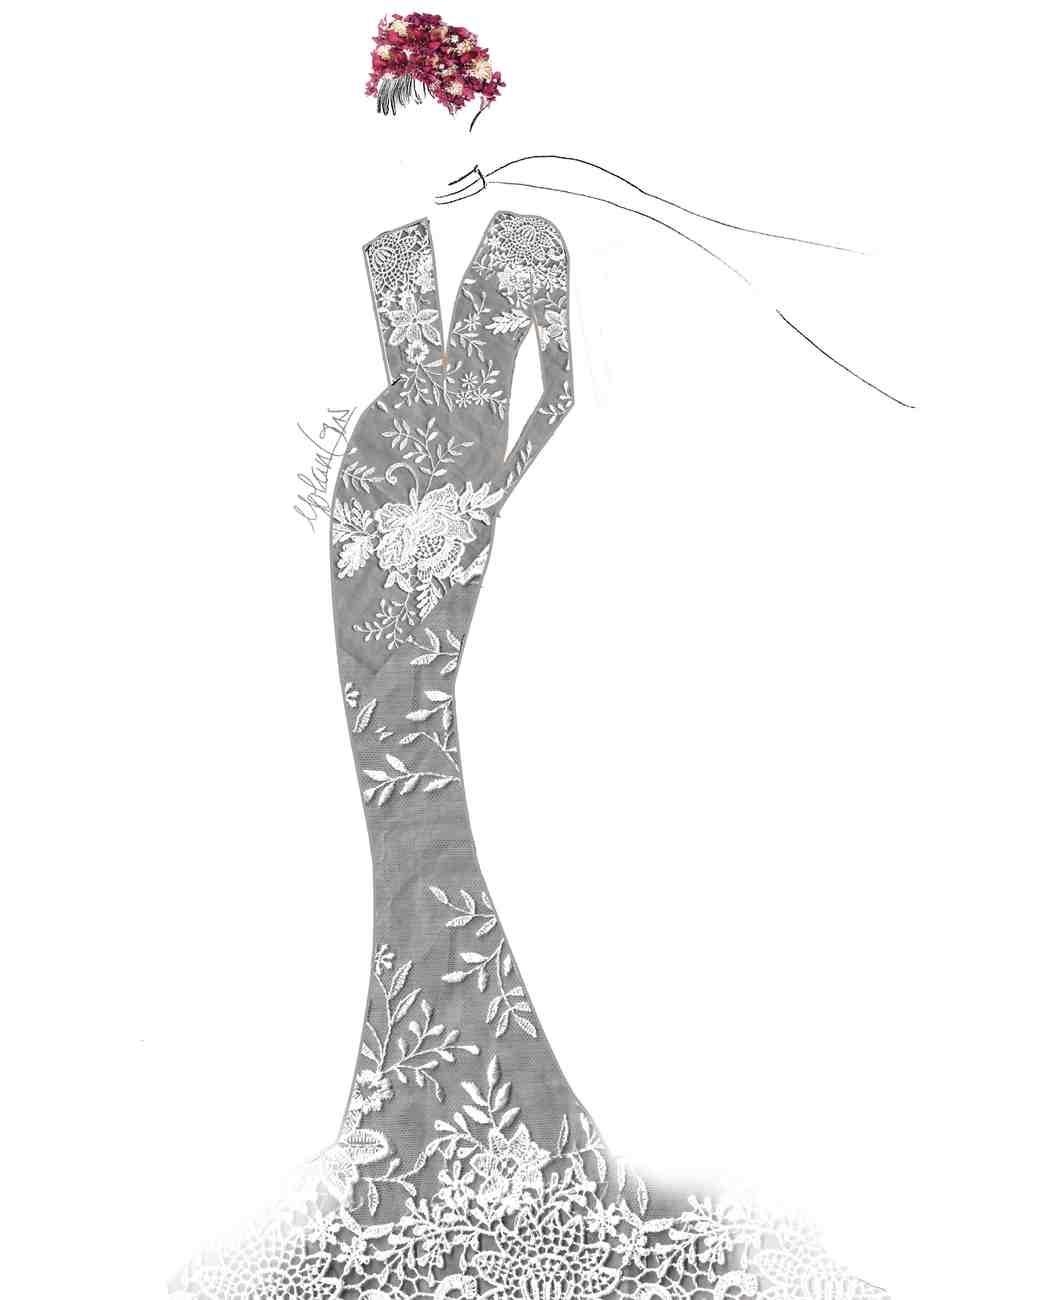 yolancris-fall-2017-exclusive-wedding-dress-sketch-0916.jpg